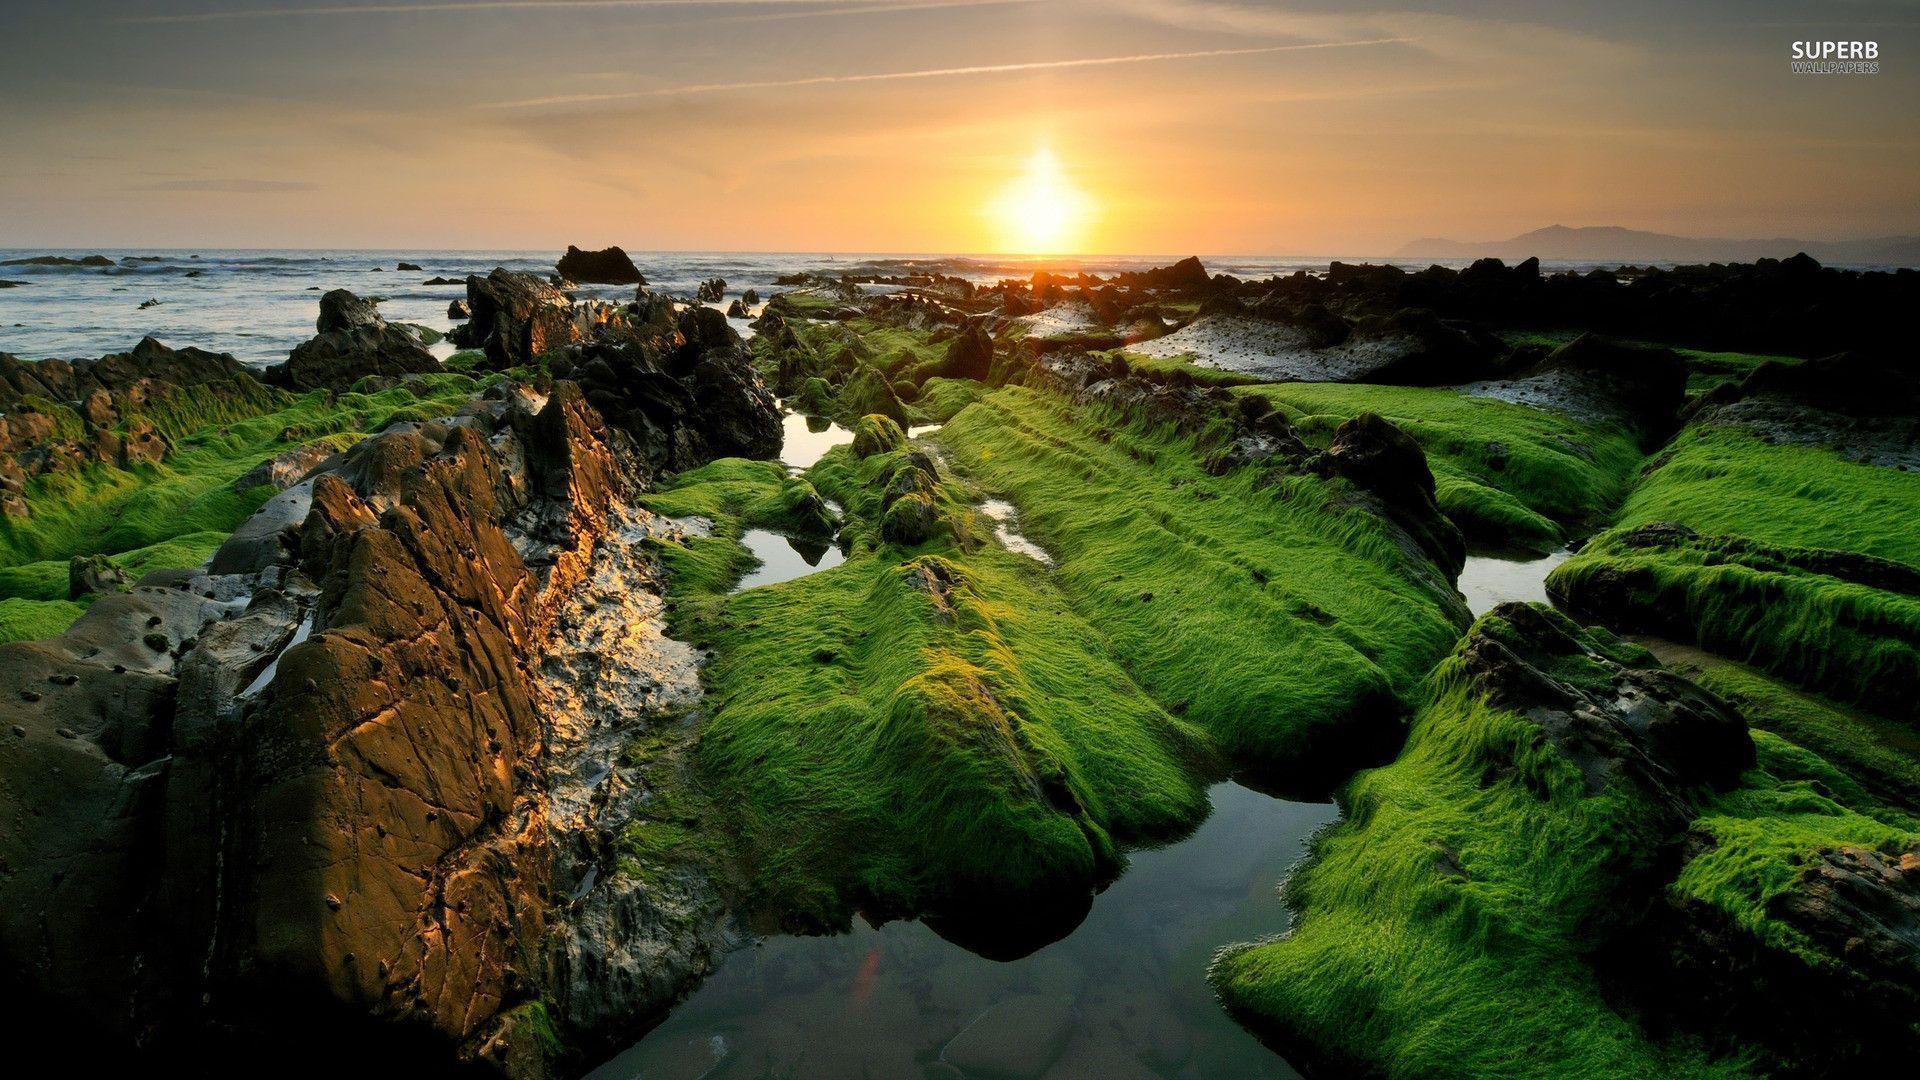 Shore in India wallpaper - Beach wallpapers - #